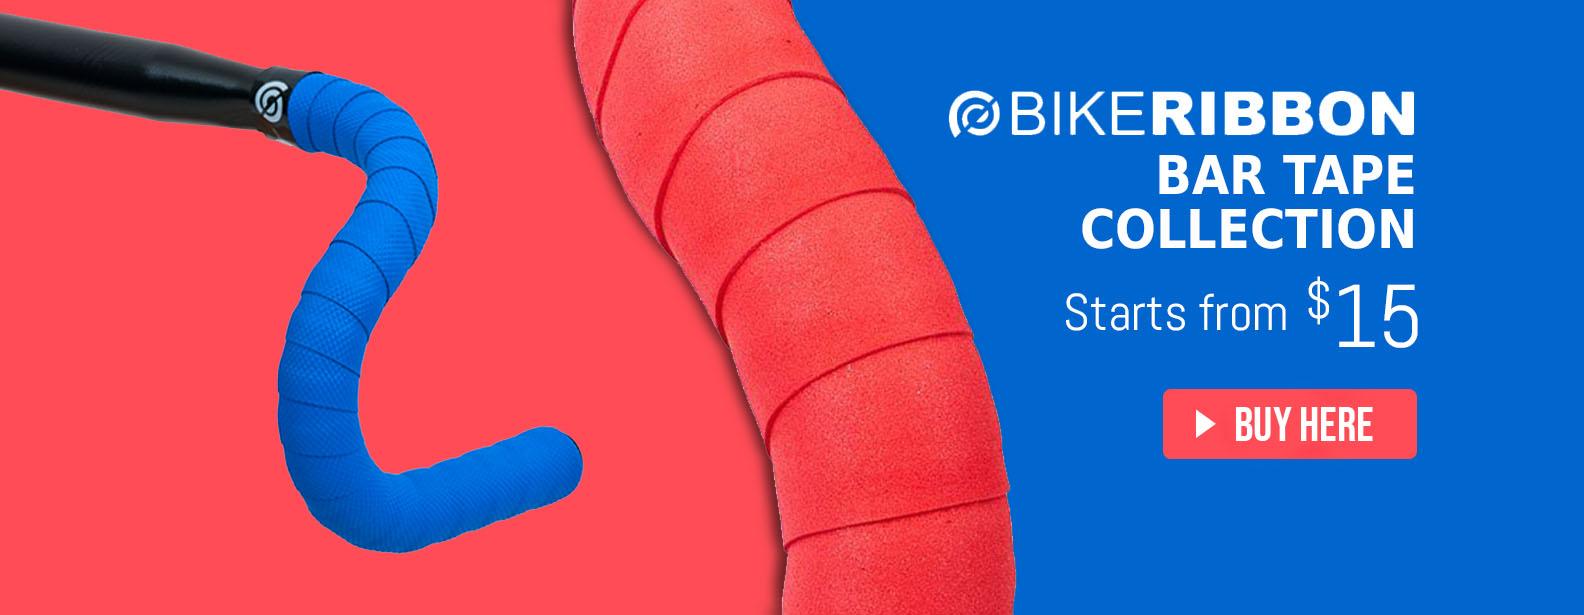 Buy Bar Tape Bike Ribbon